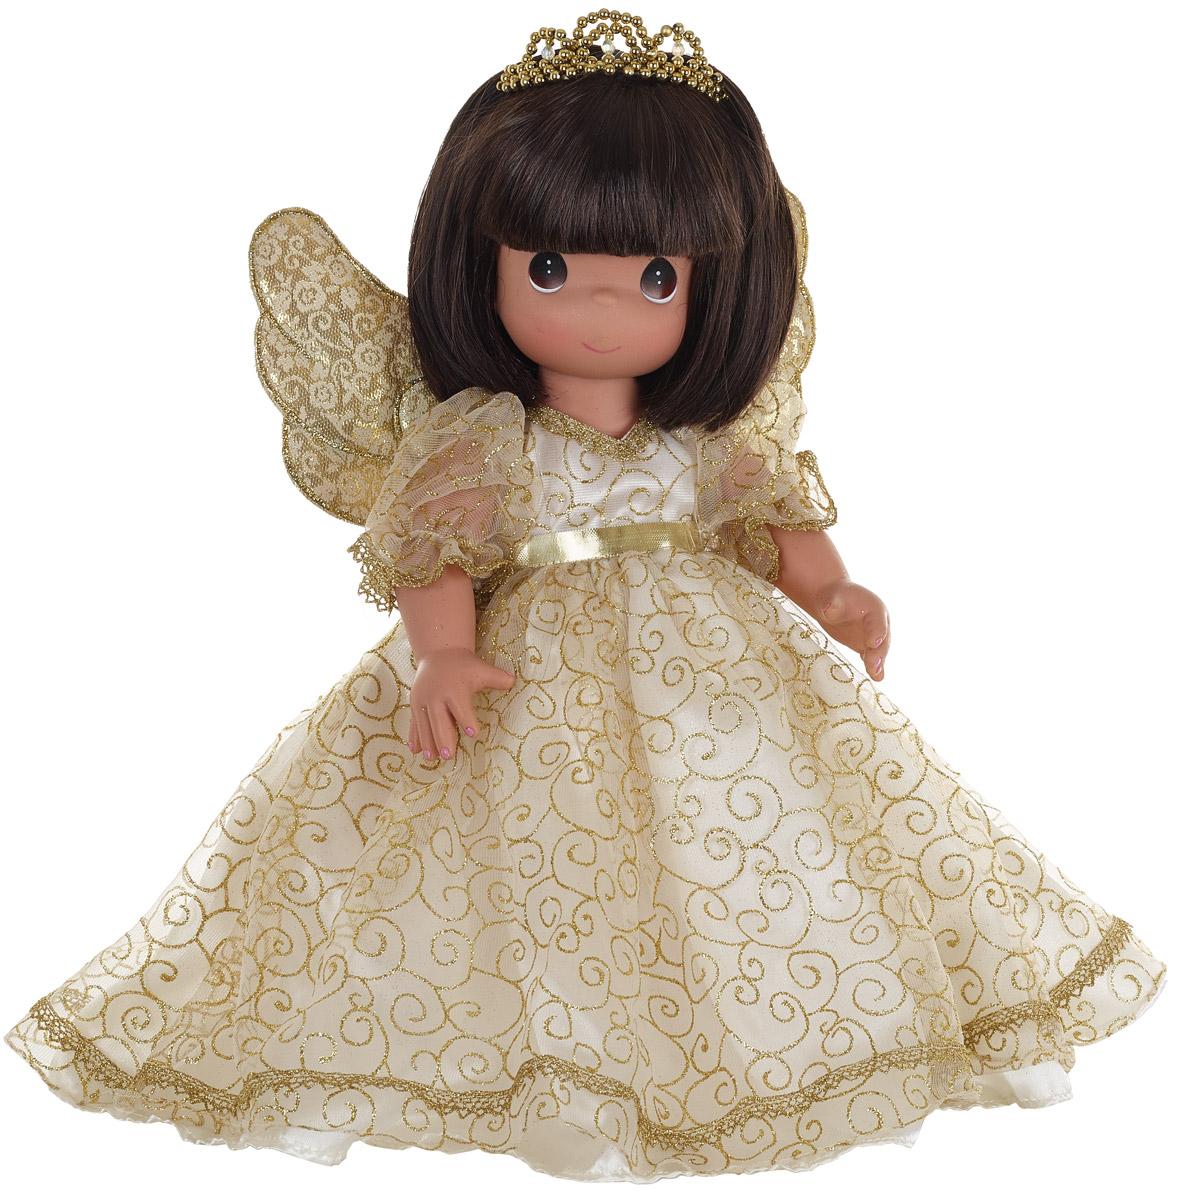 Precious Moments Кукла Ангельский шепот брюнетка куклы и одежда для кукол precious кукла балерина рыжая 30 см